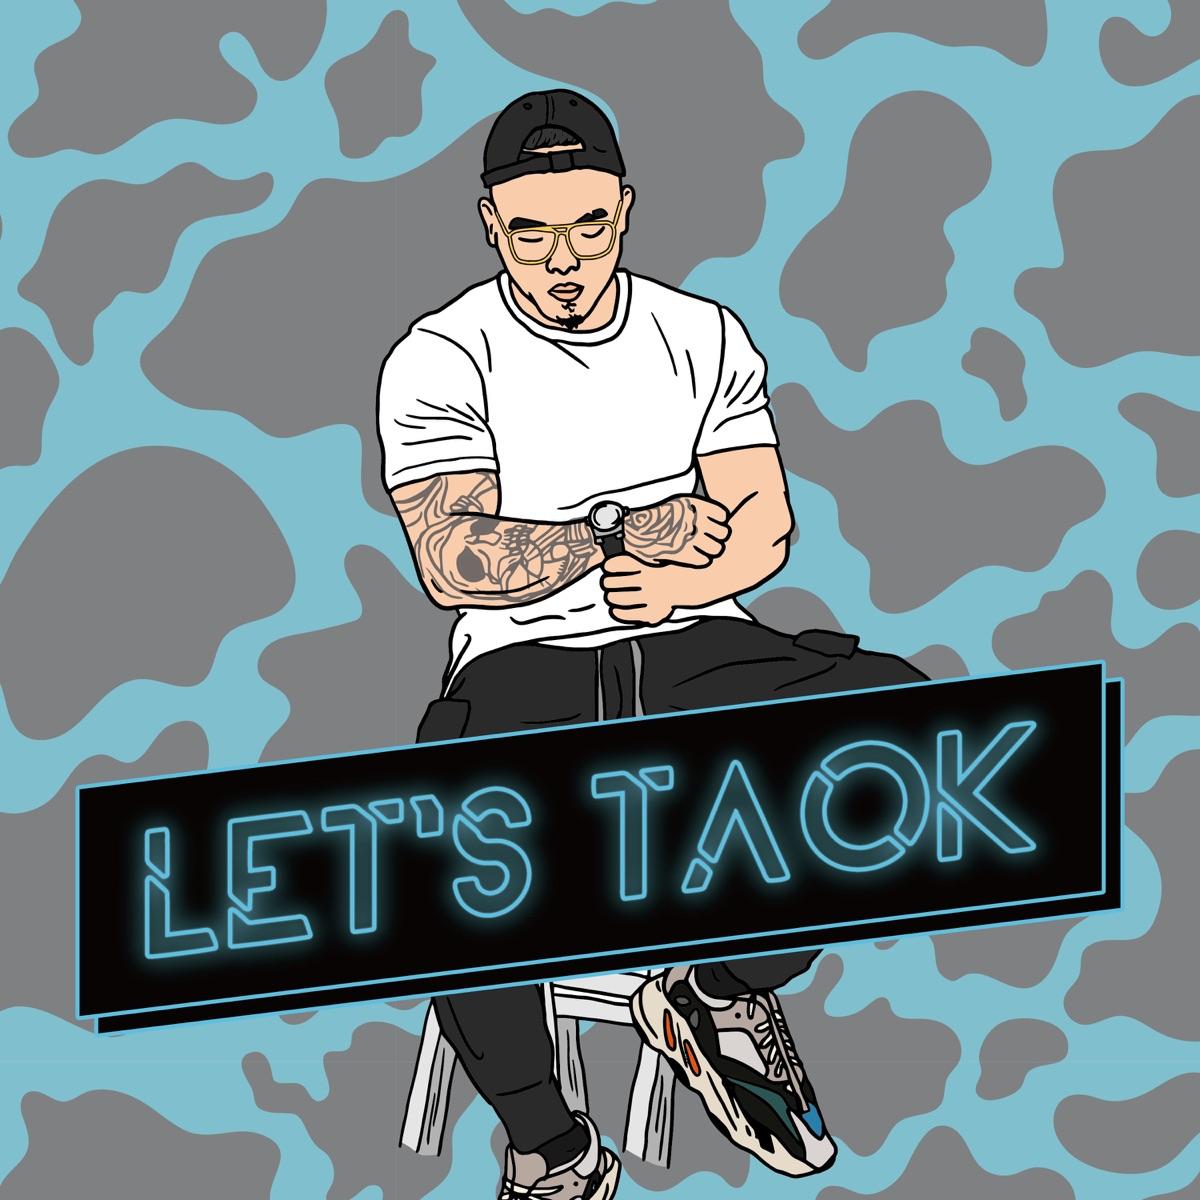 LET'S TAOK